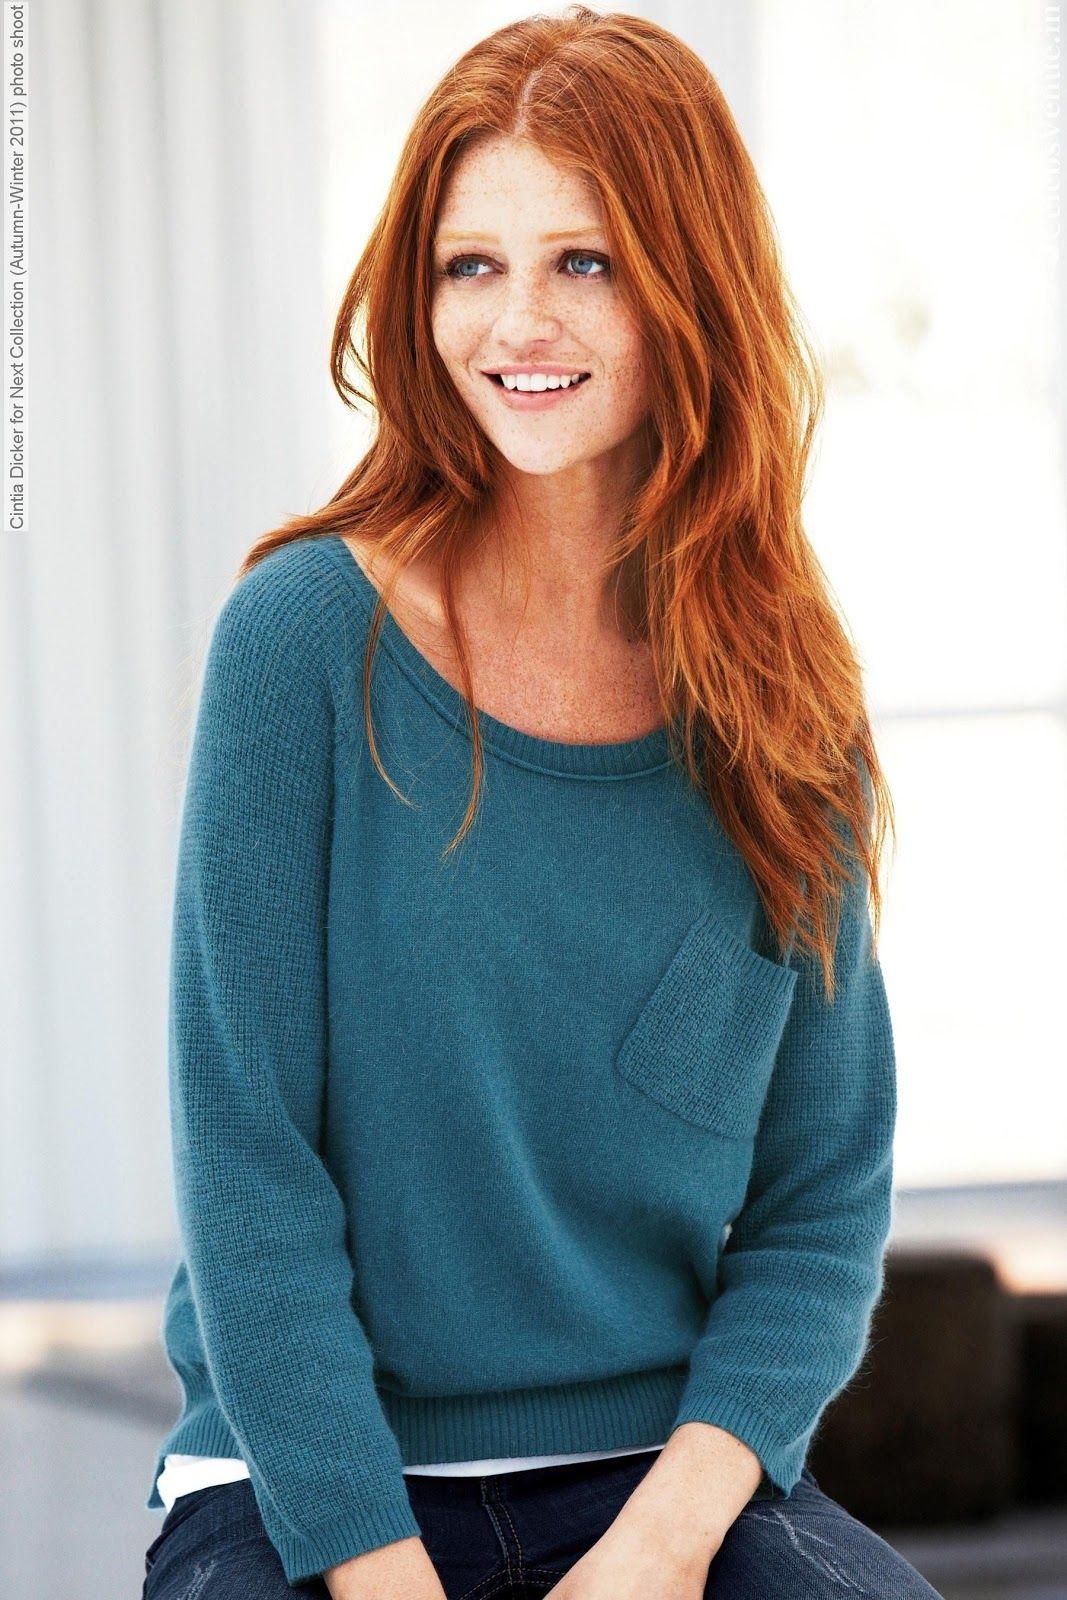 Cintia Dicker Gorgeous Redhead Cintia Dicker Red Hair Inspiration